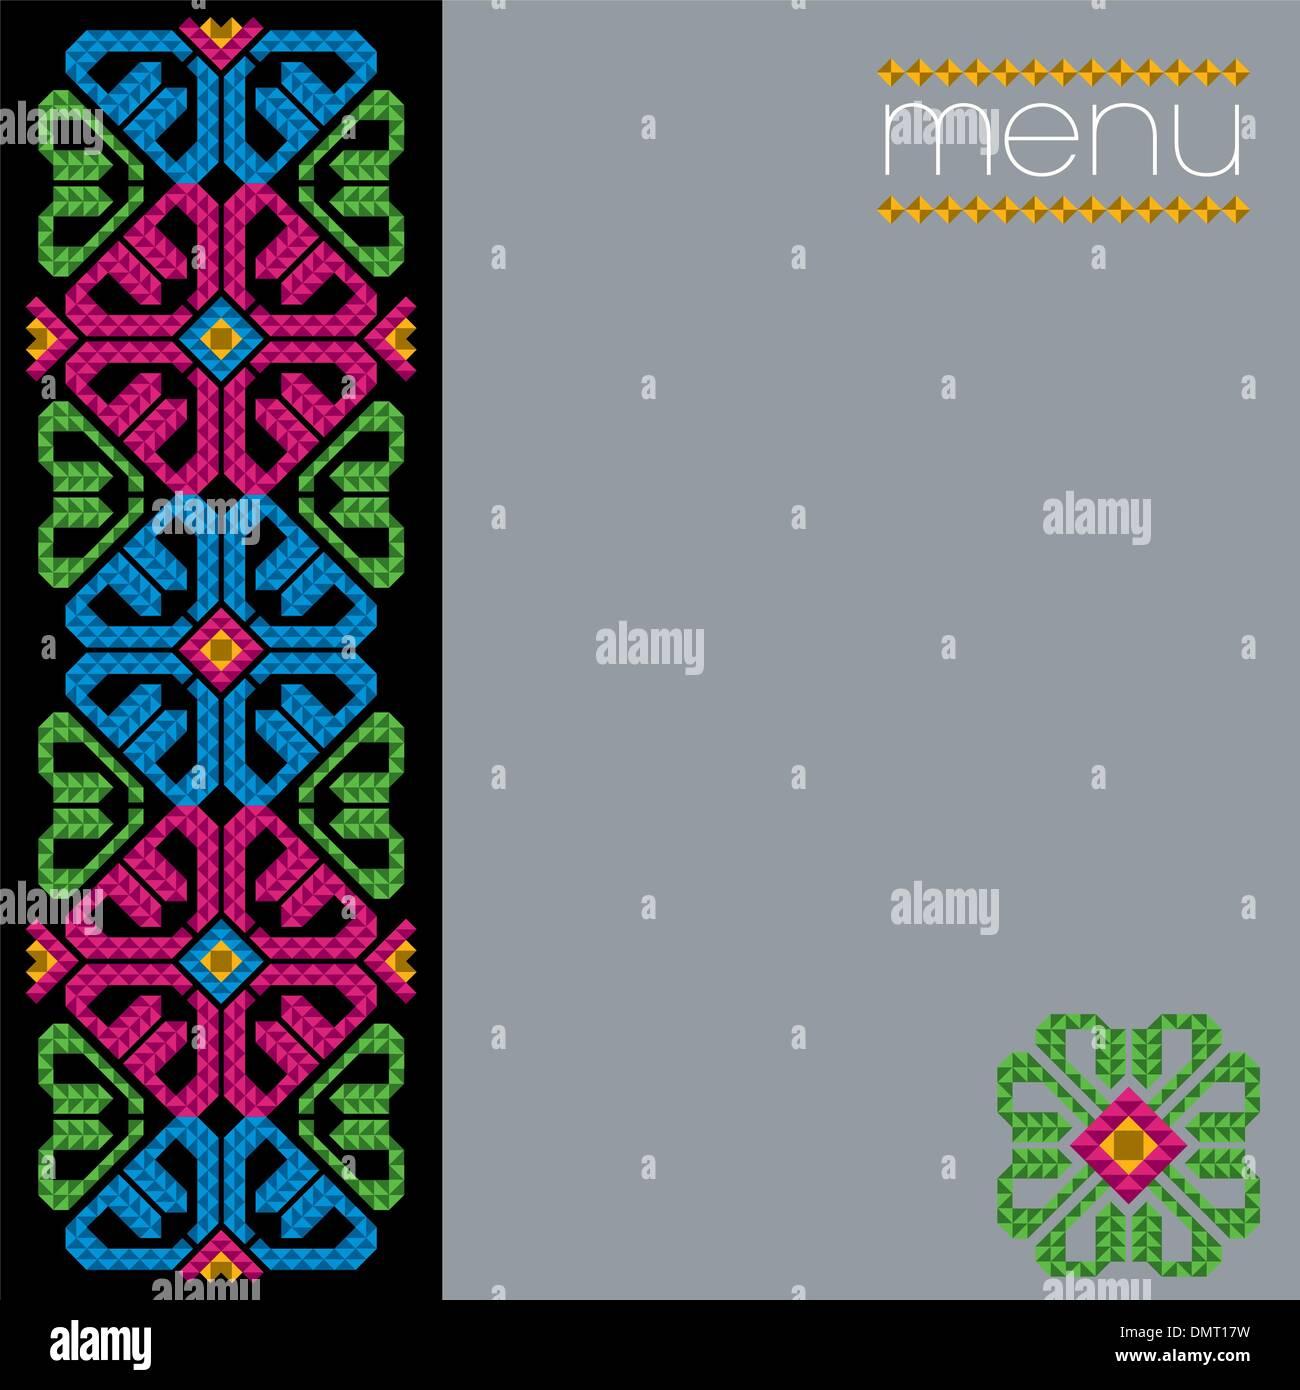 mexican restaurant menu cover design stock vector art illustration